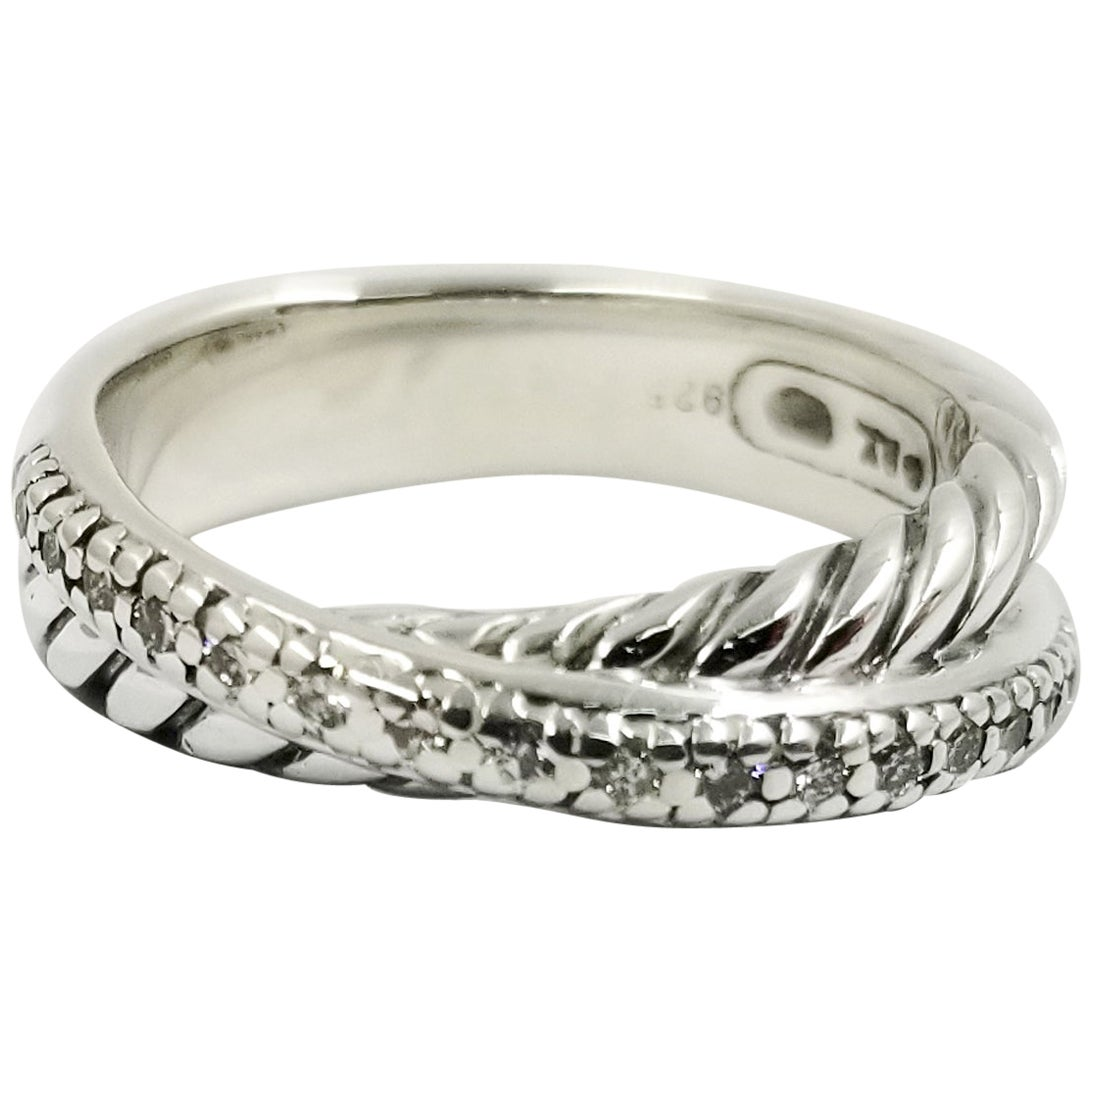 David Yurman Sterling Silver and Diamond Crossover Ring Band